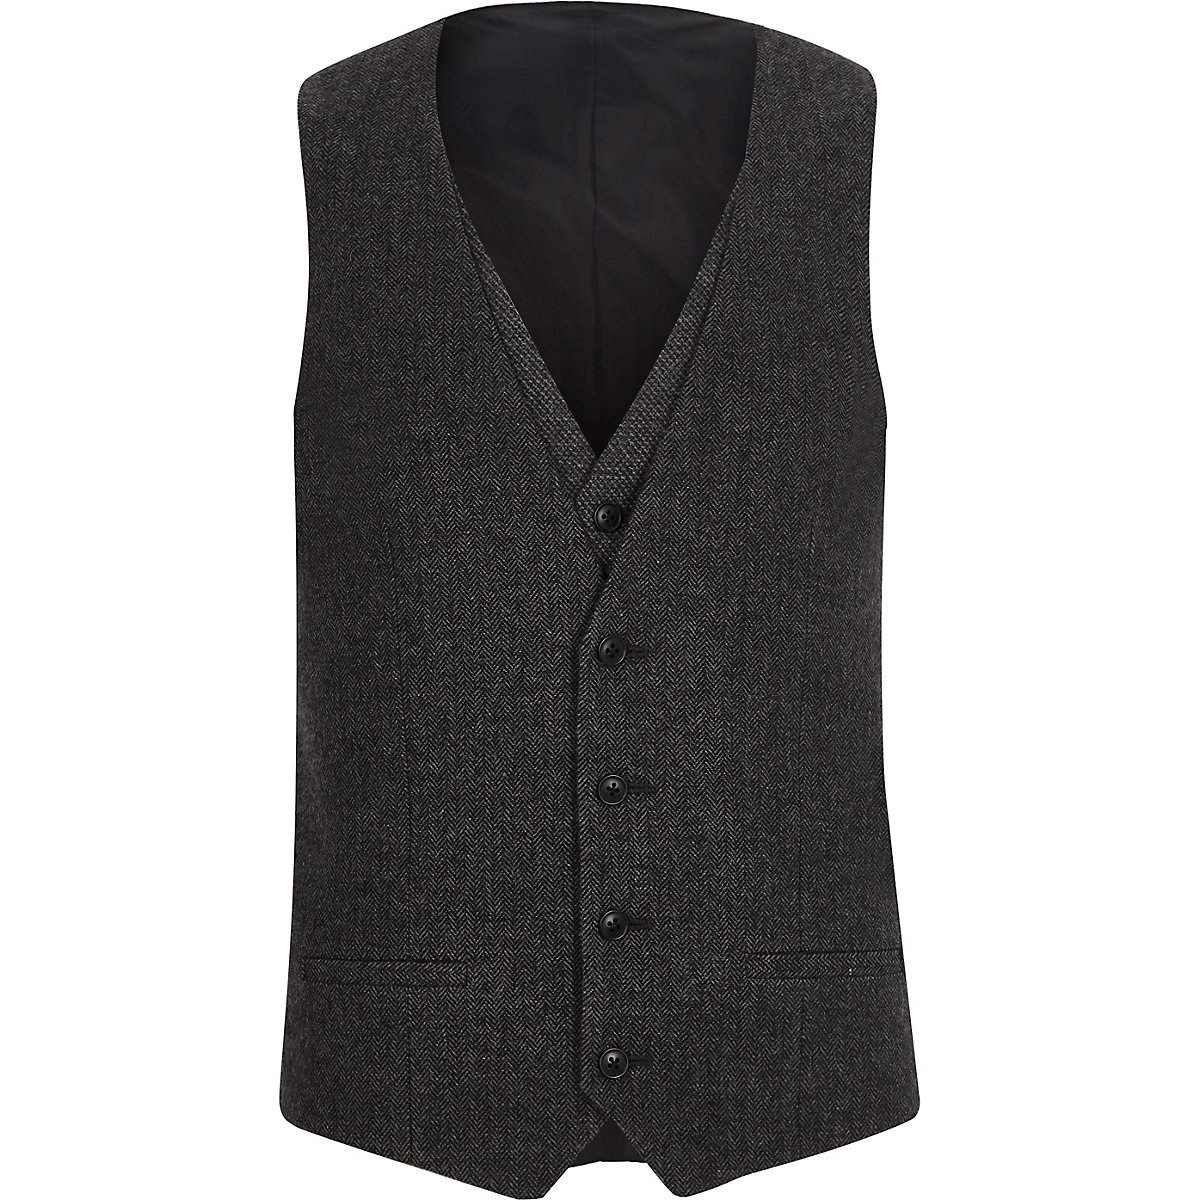 Charcoal grey herringbone vest